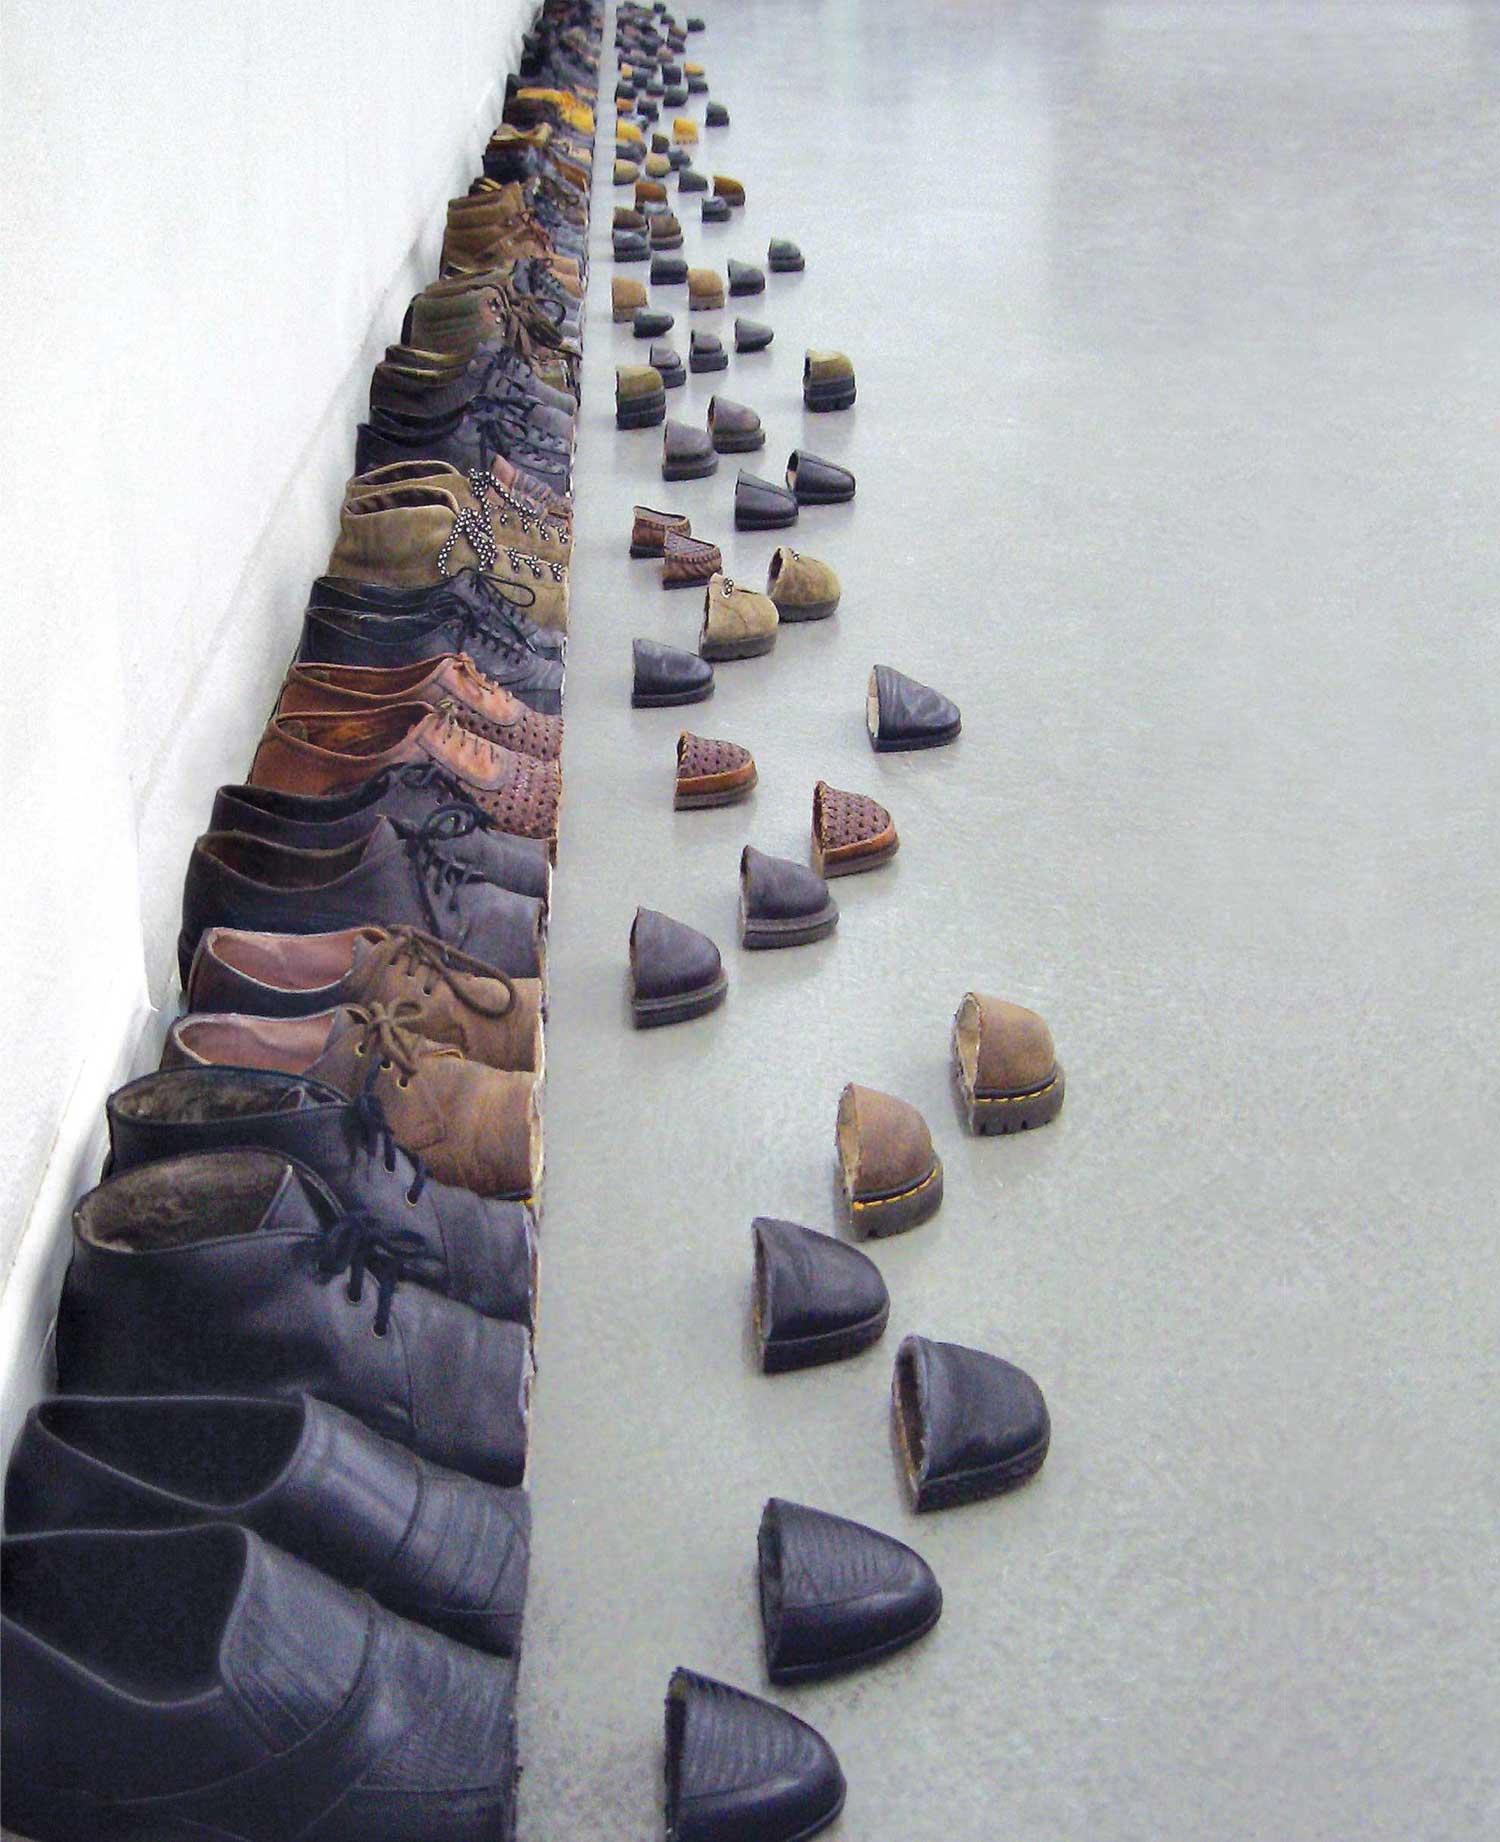 Schuhe mit kunstvollem Schnitt Sakir-Gokcebag-shoes_04